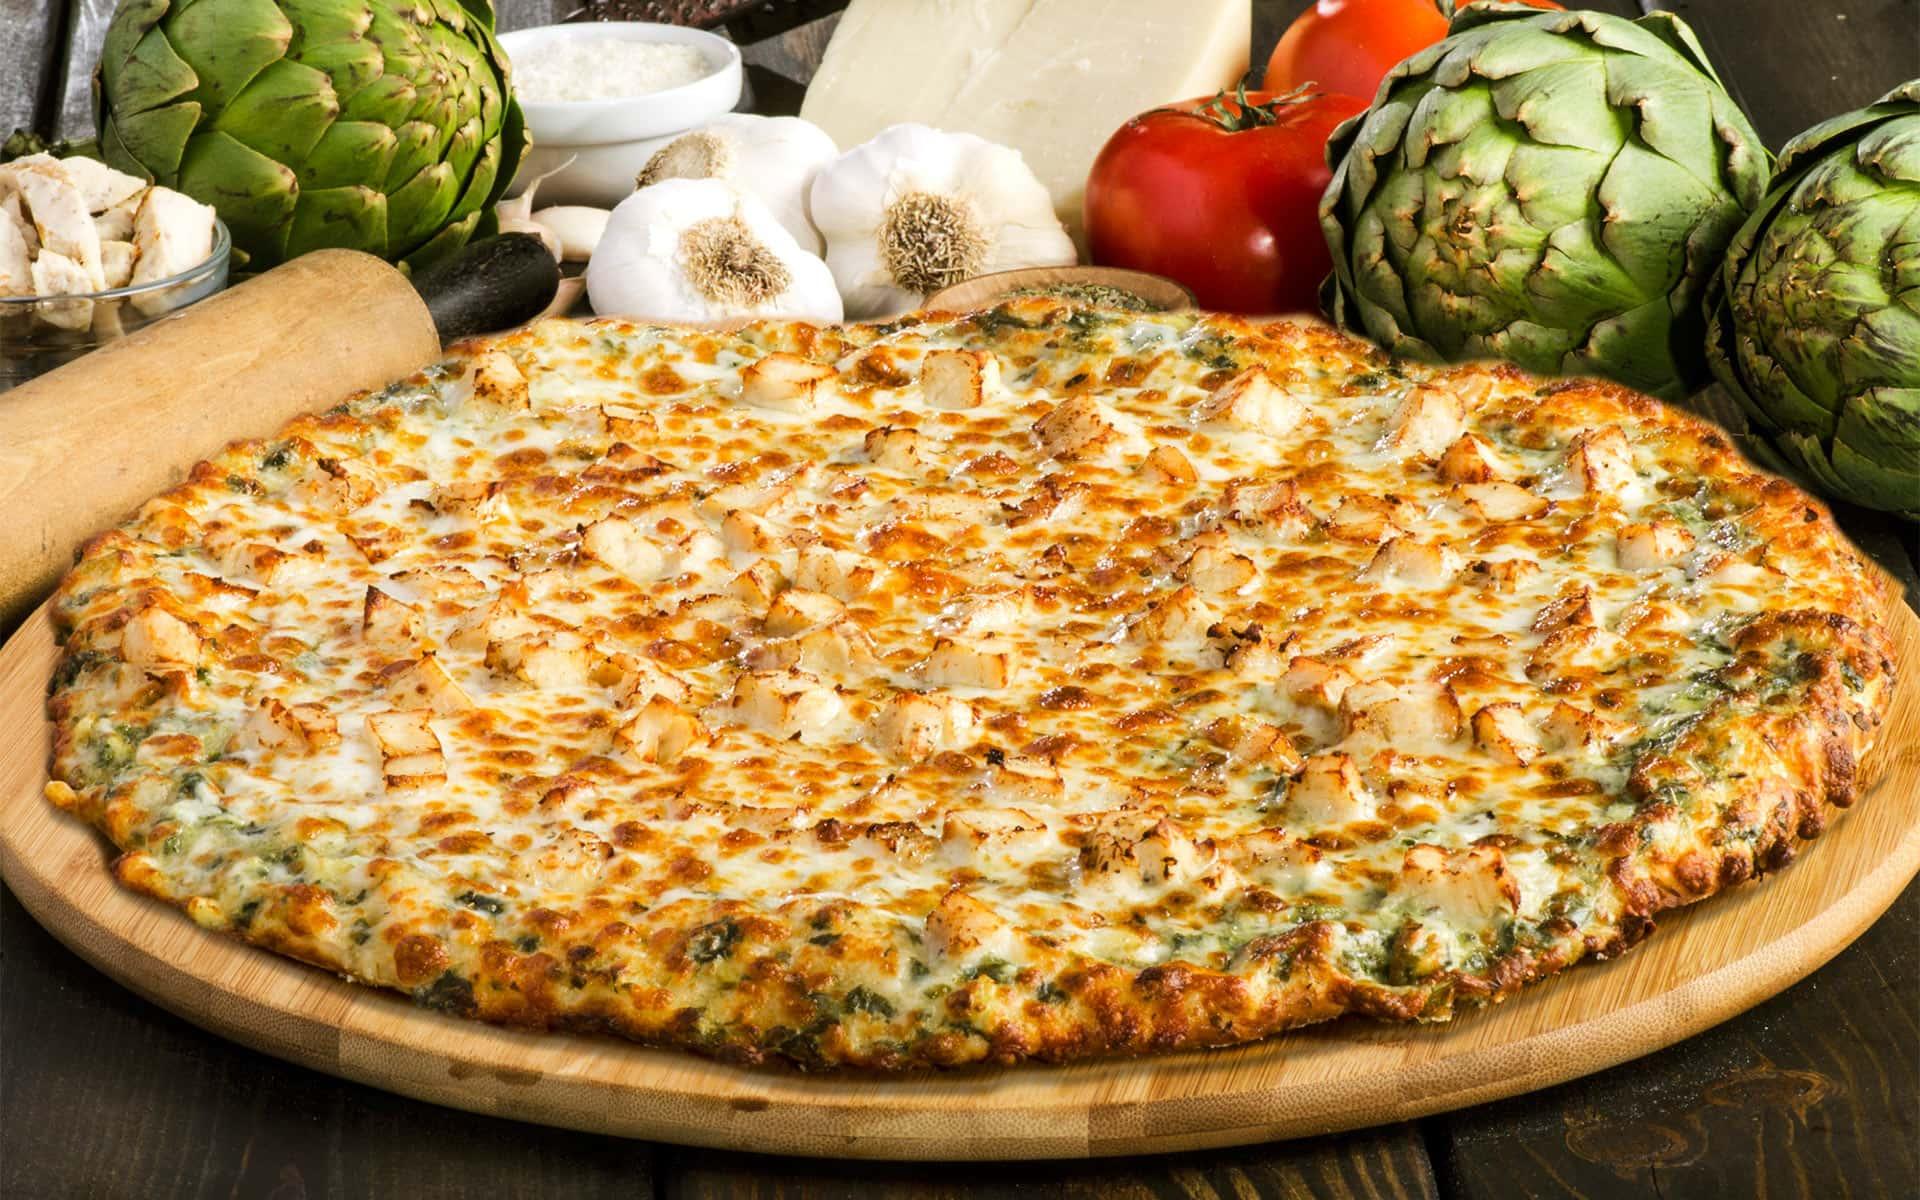 Sir Pizza Chicken Spinach Artichoke Pizza